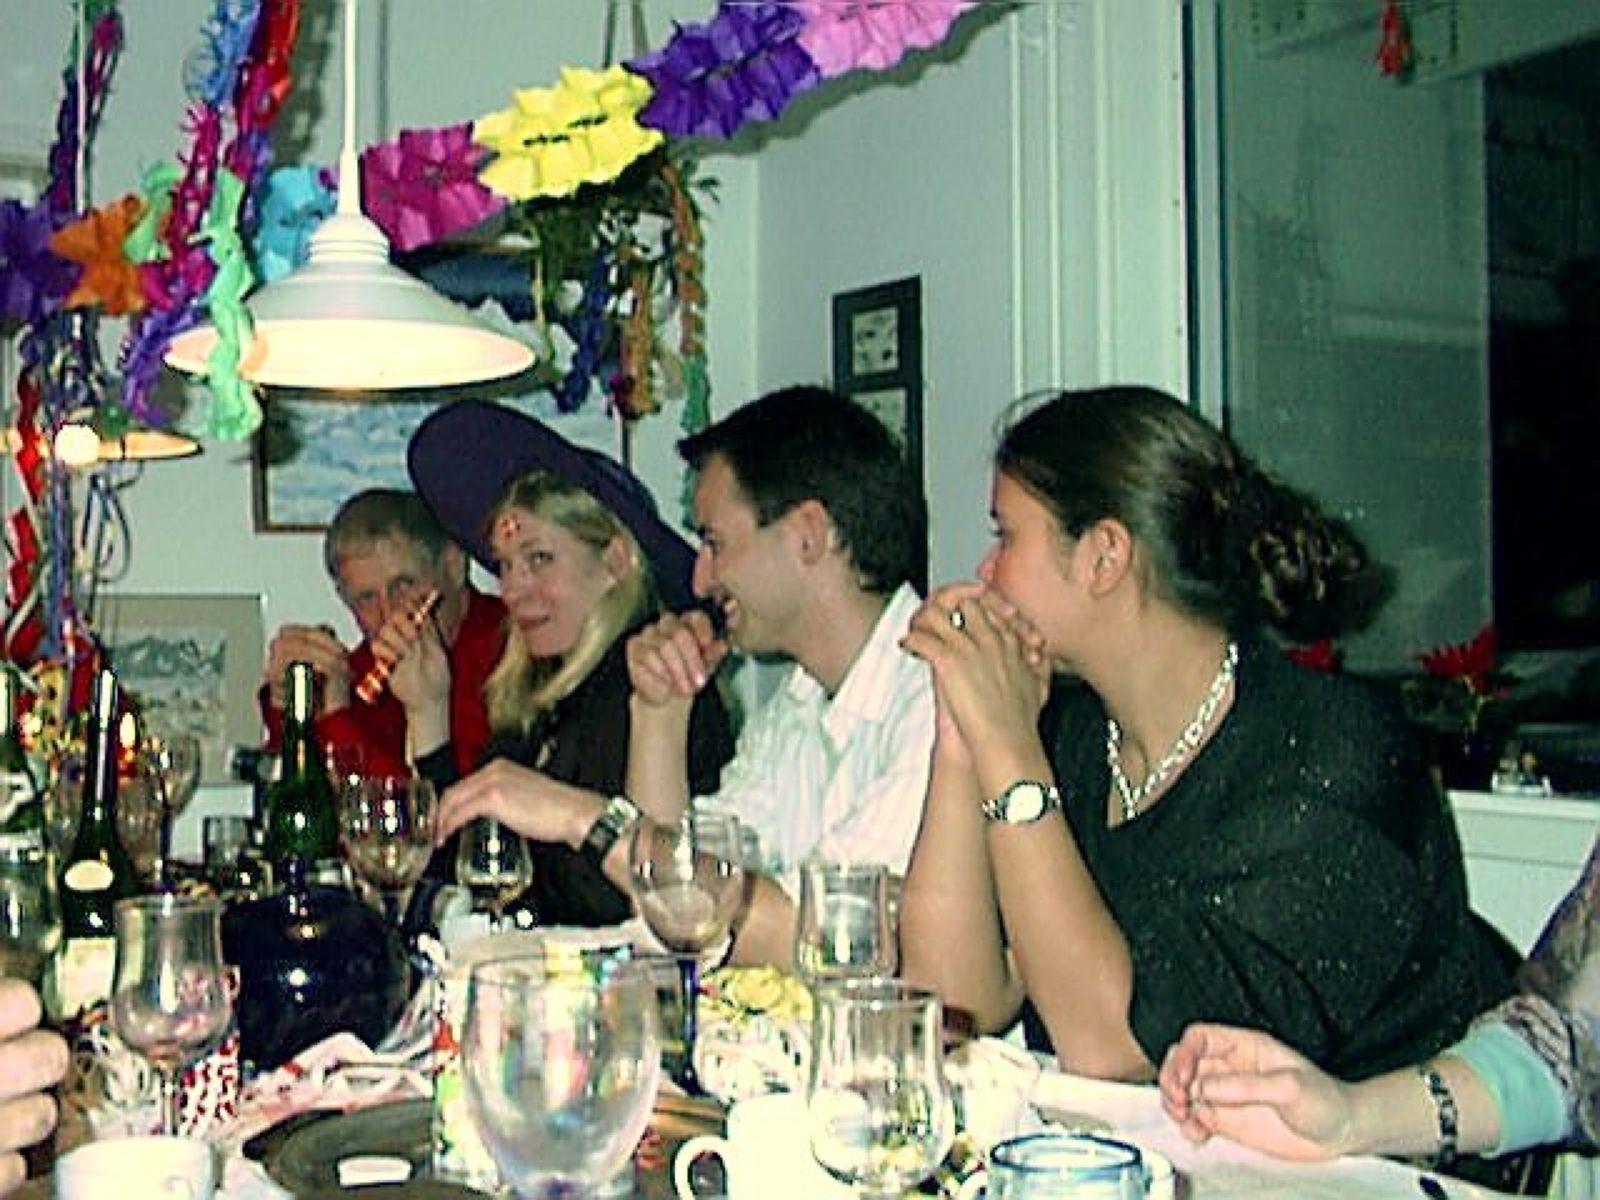 1997-12-30-2055_-_Bodil Marie Damgård;